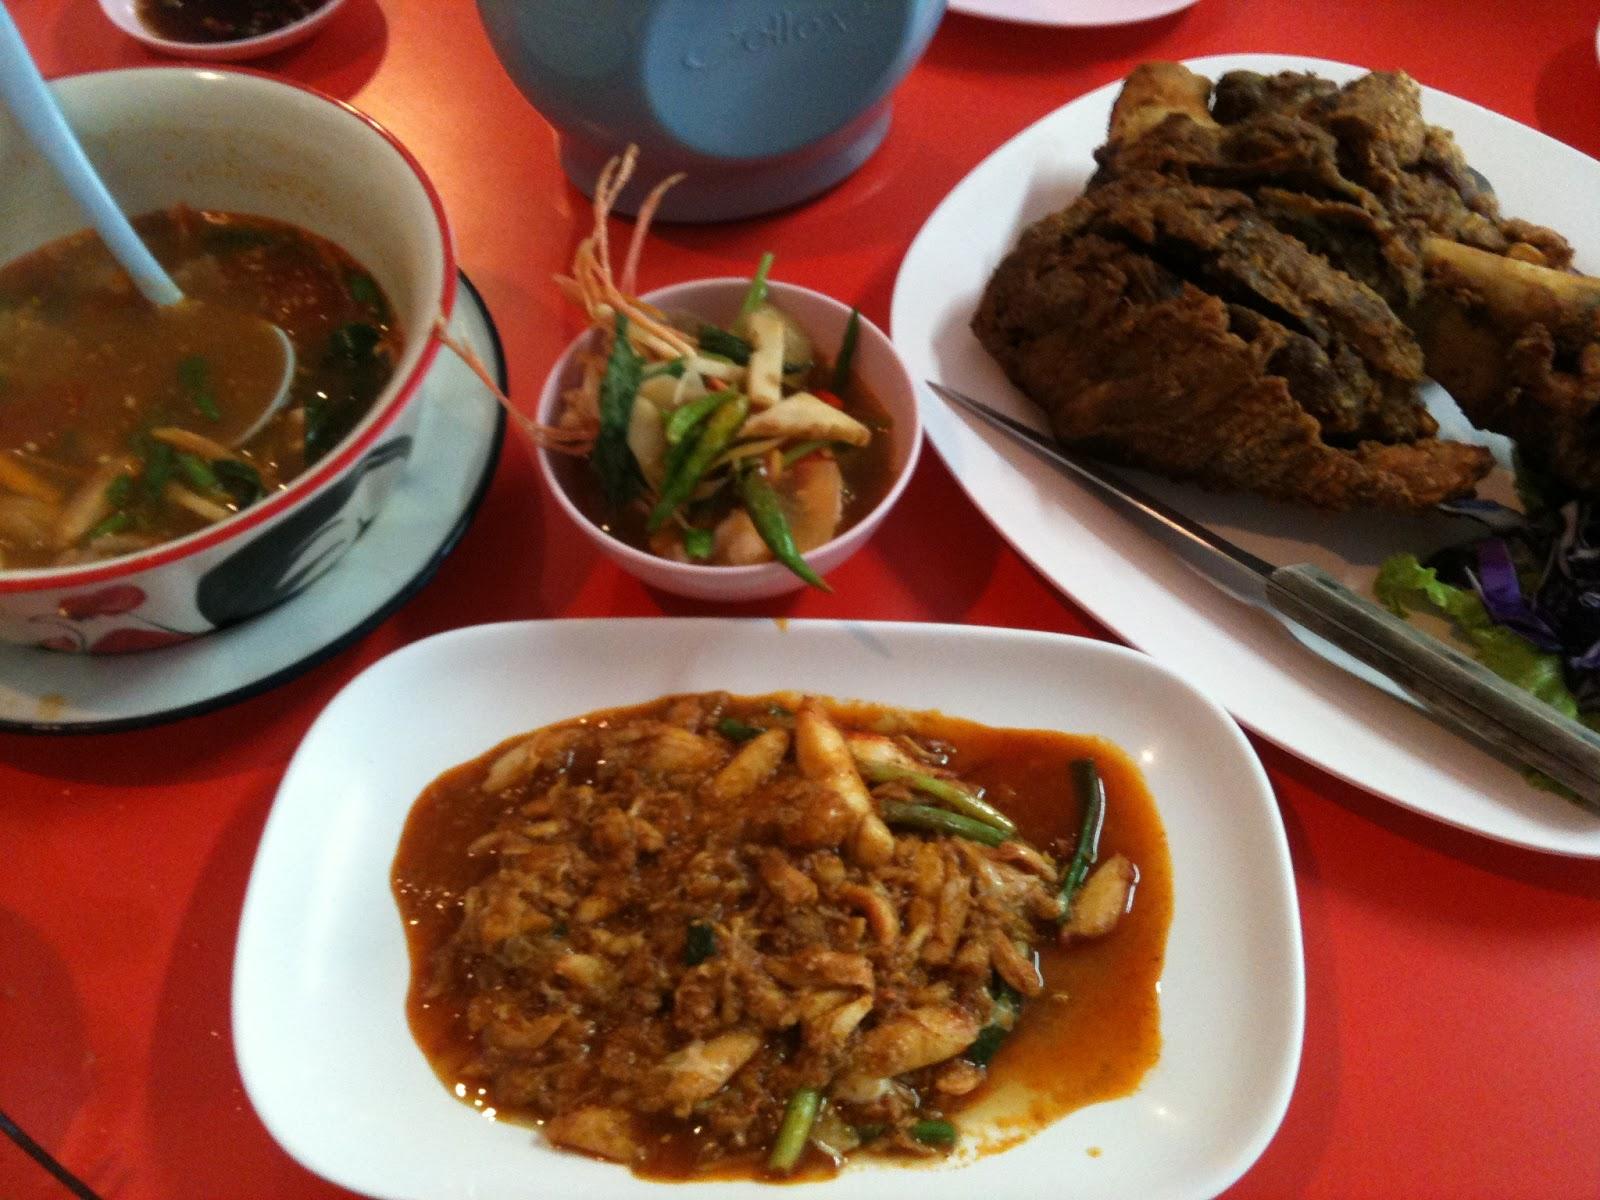 Thai Food 123: Tomyam, Pork Knuckle and Crab Meat at Danok